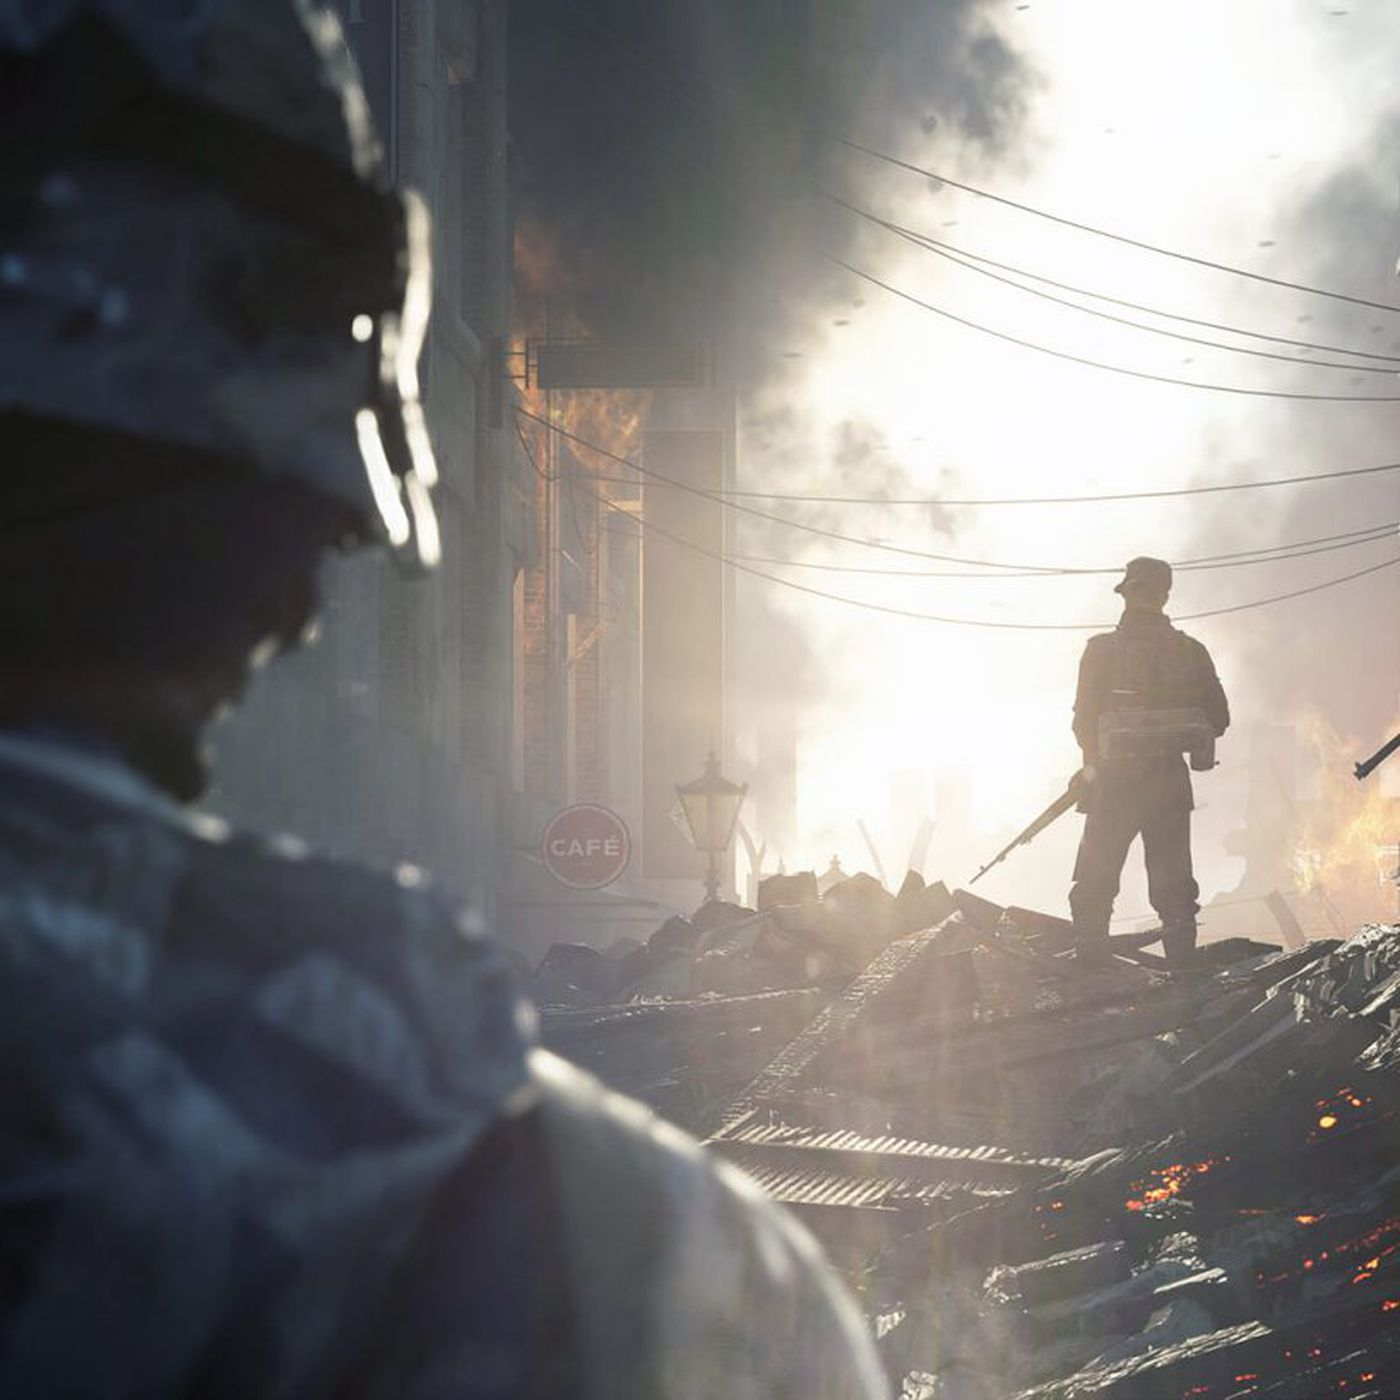 Nvidia RTX: Watch Battlefield 5 & Shadow of the Tomb Raider